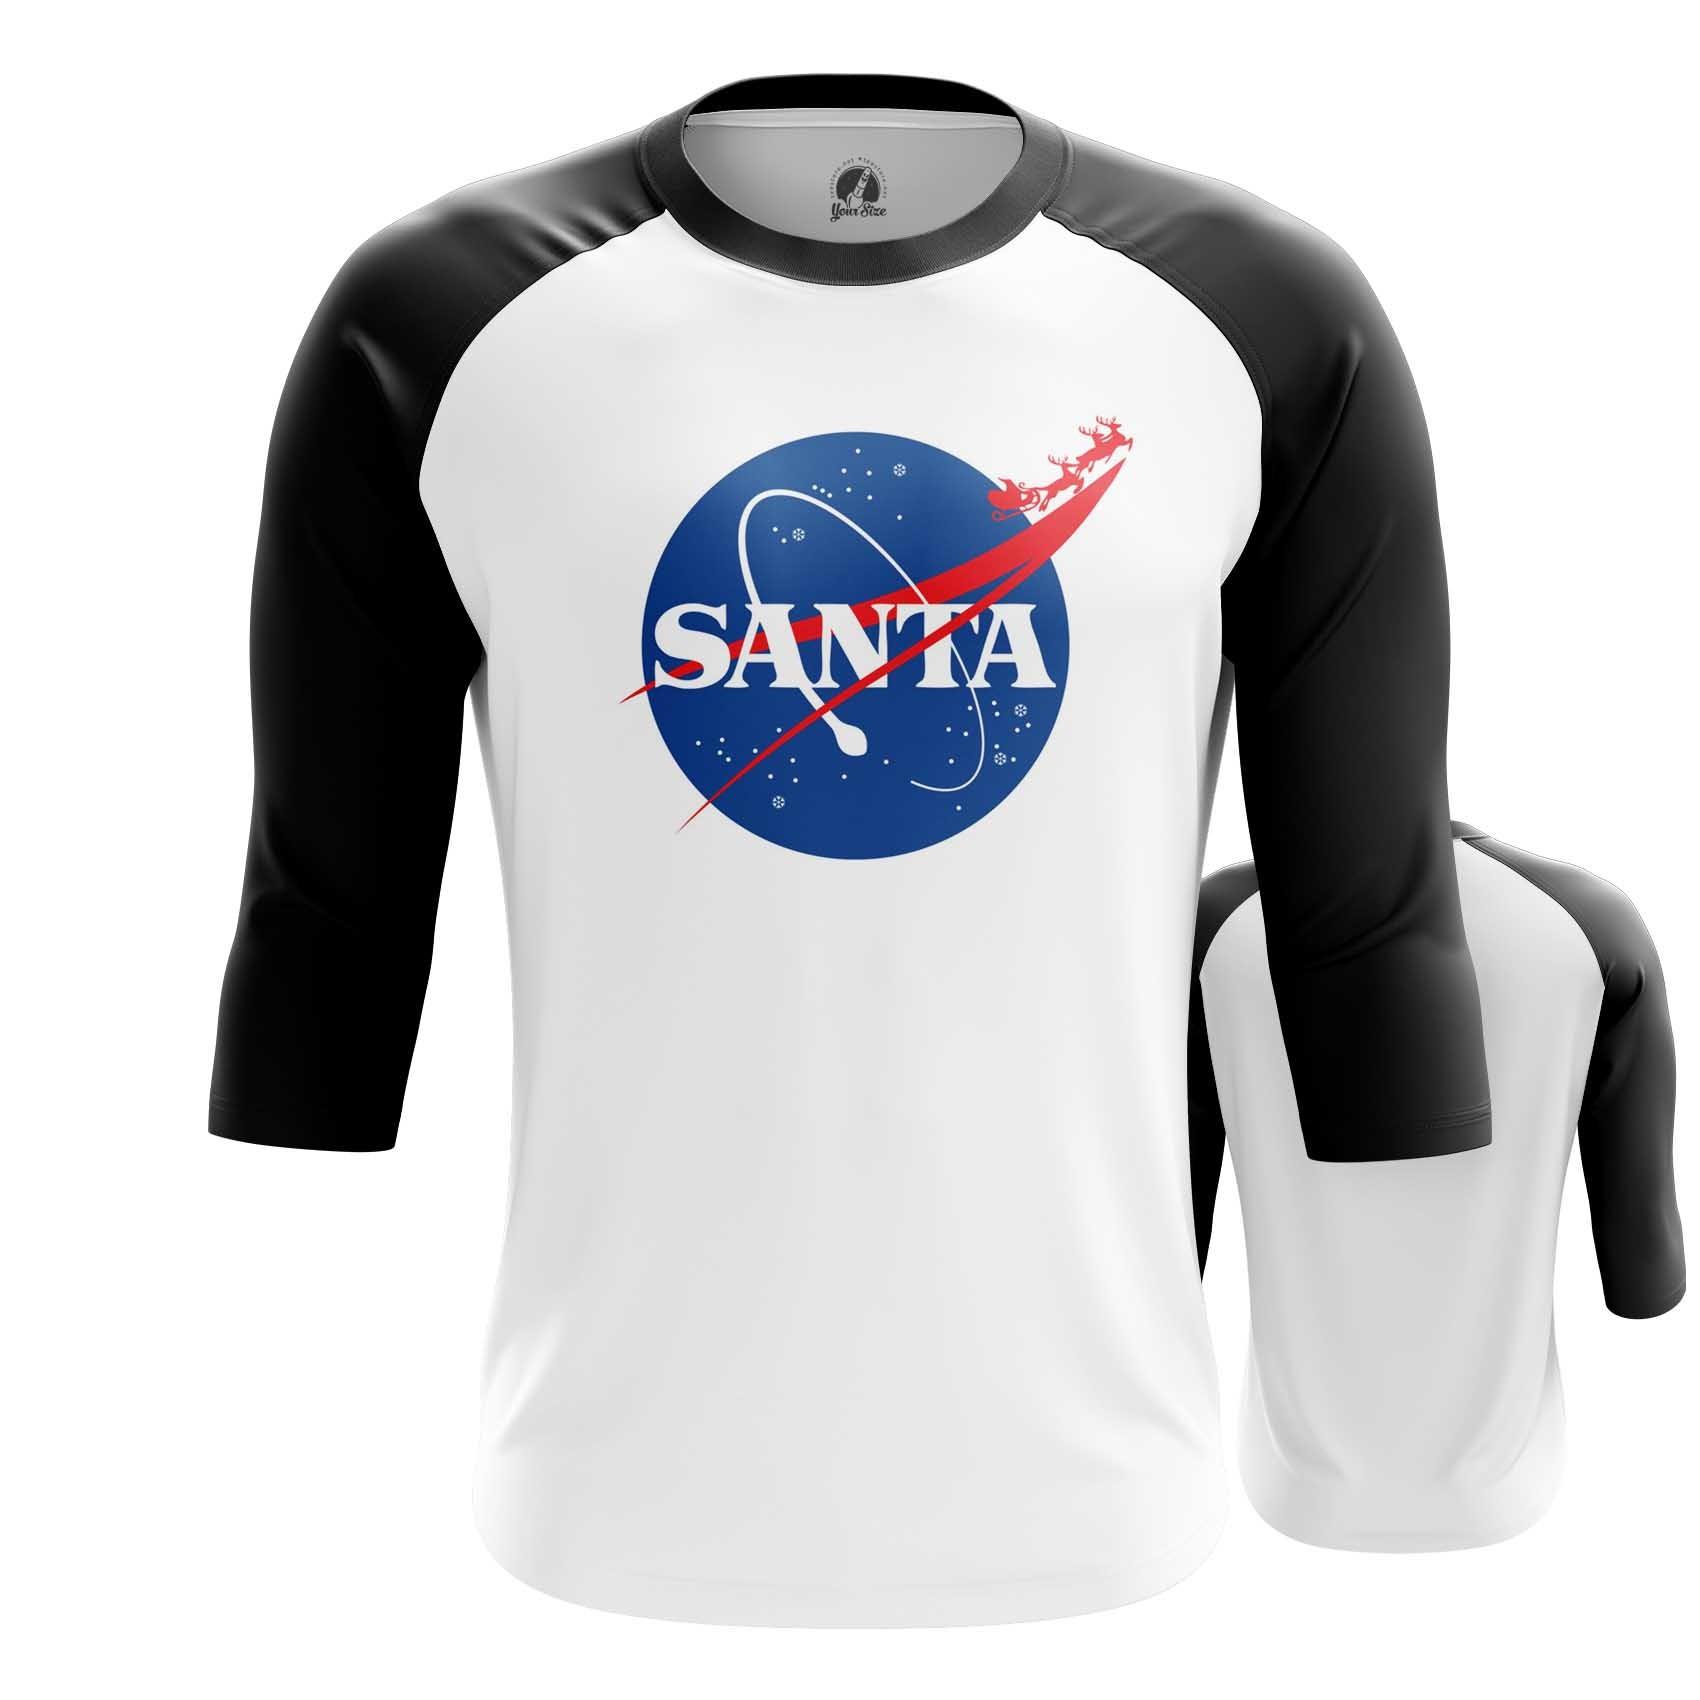 Merchandise Space Santa Claus T-Shirt Nasa Christmas